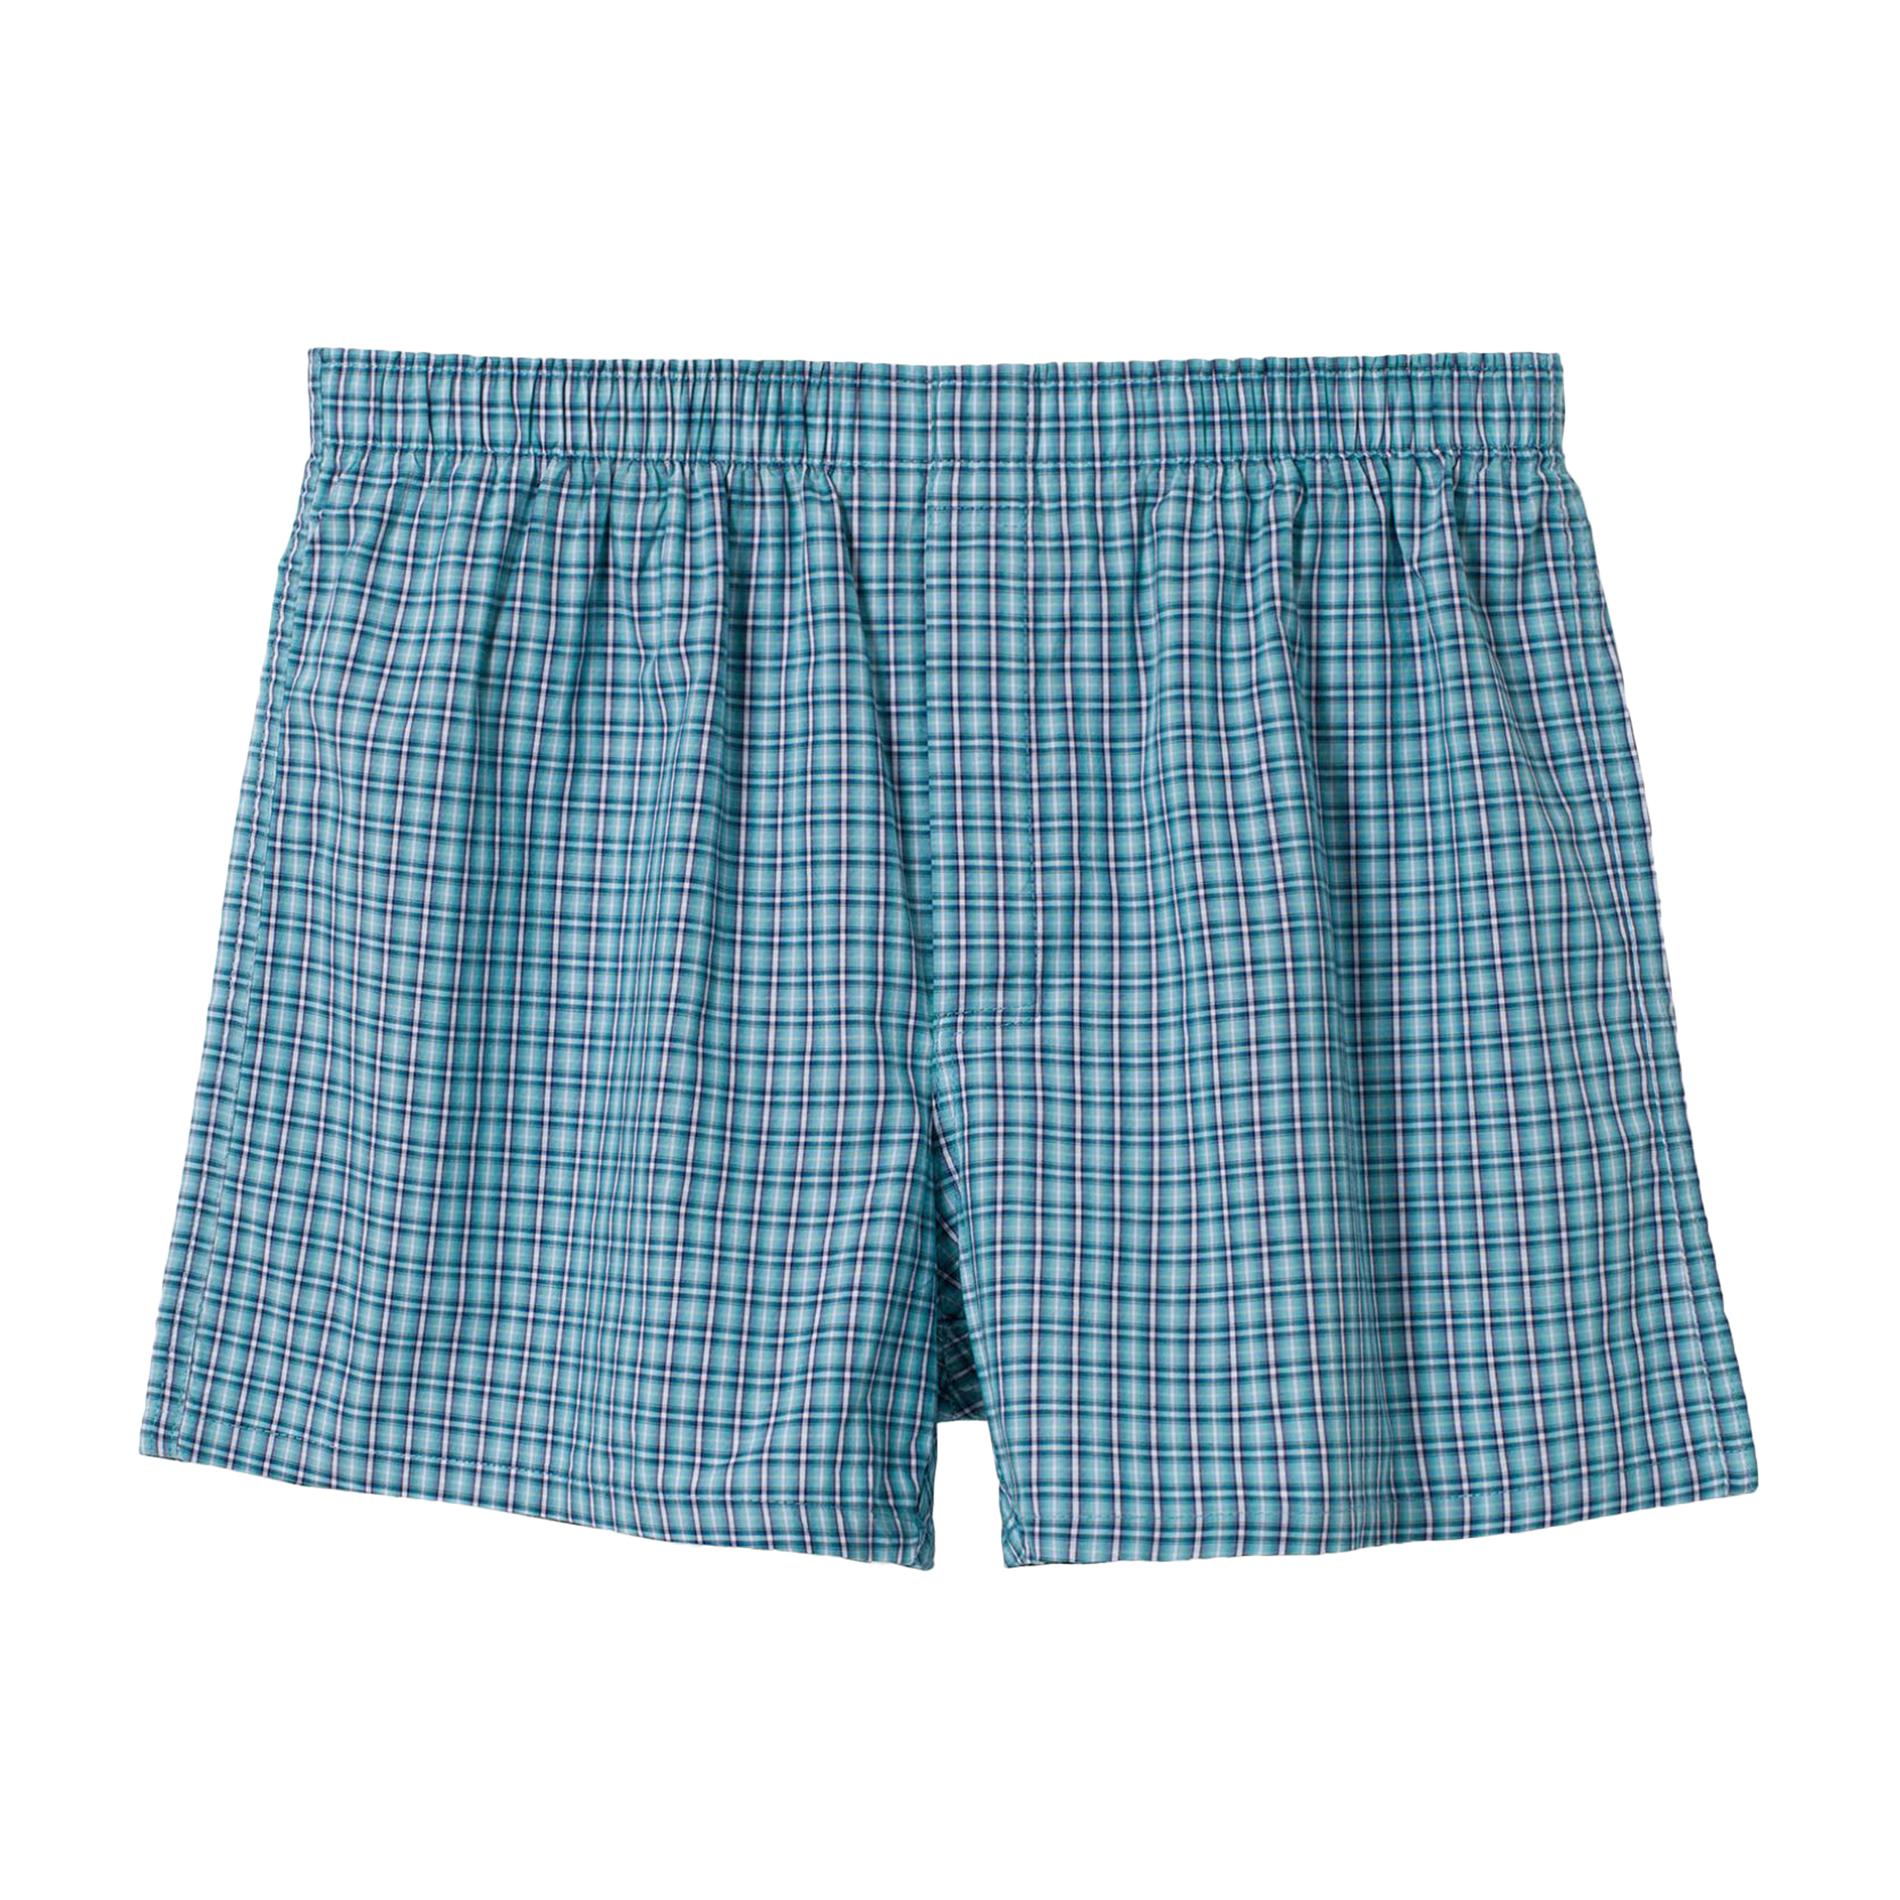 XXL,Blue bossini Life Mens Cotton Woven Underwears Boxers Shorts S